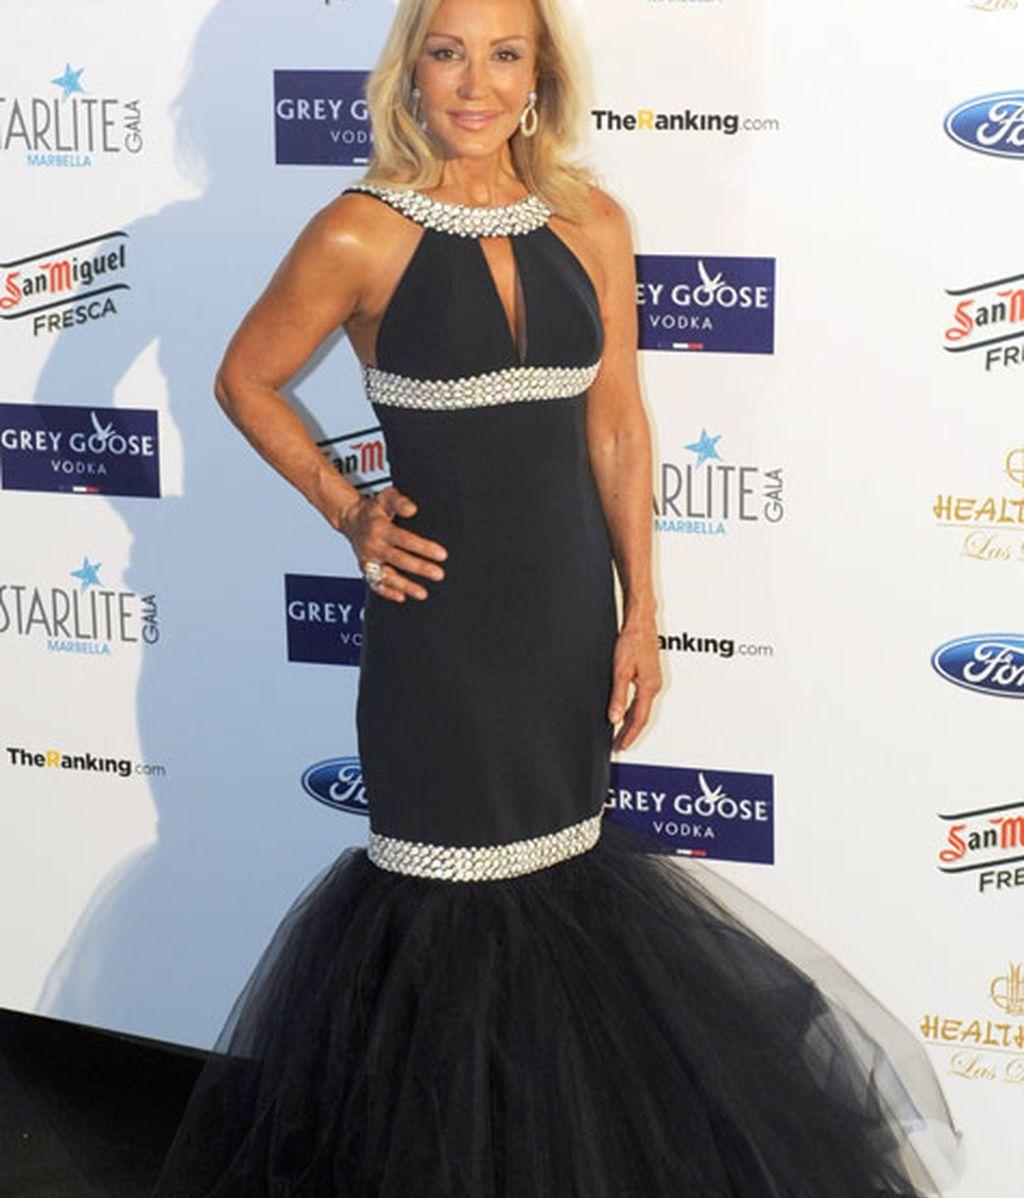 Carmen Lomana eligió un vestido negro con detalles brillantes